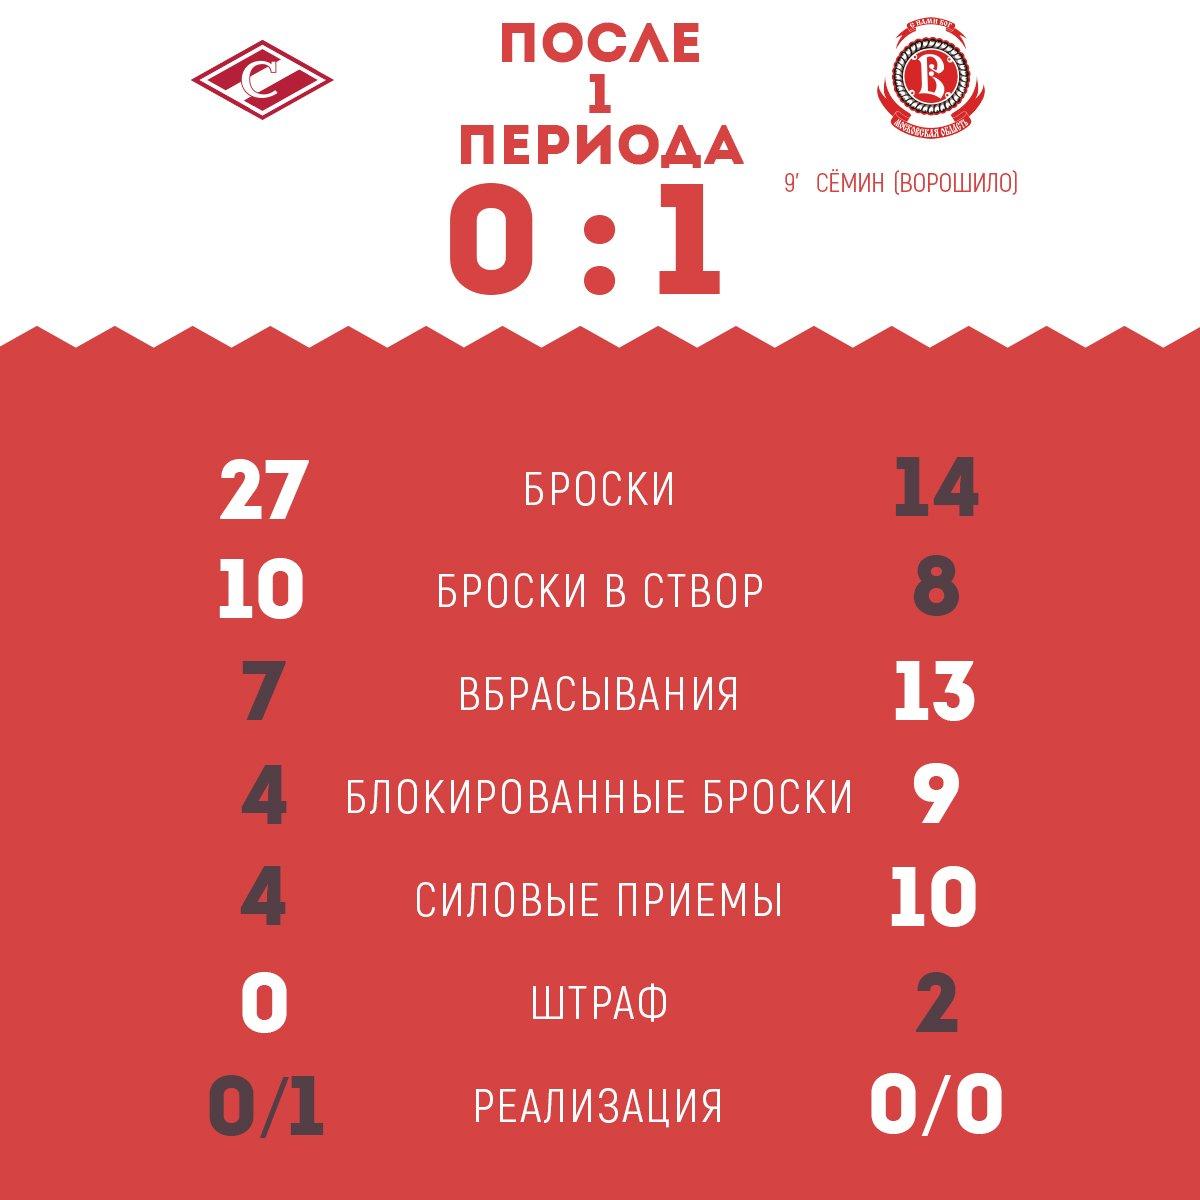 Статистика матча «Спартак» vs «Витязь» после 1-го периода